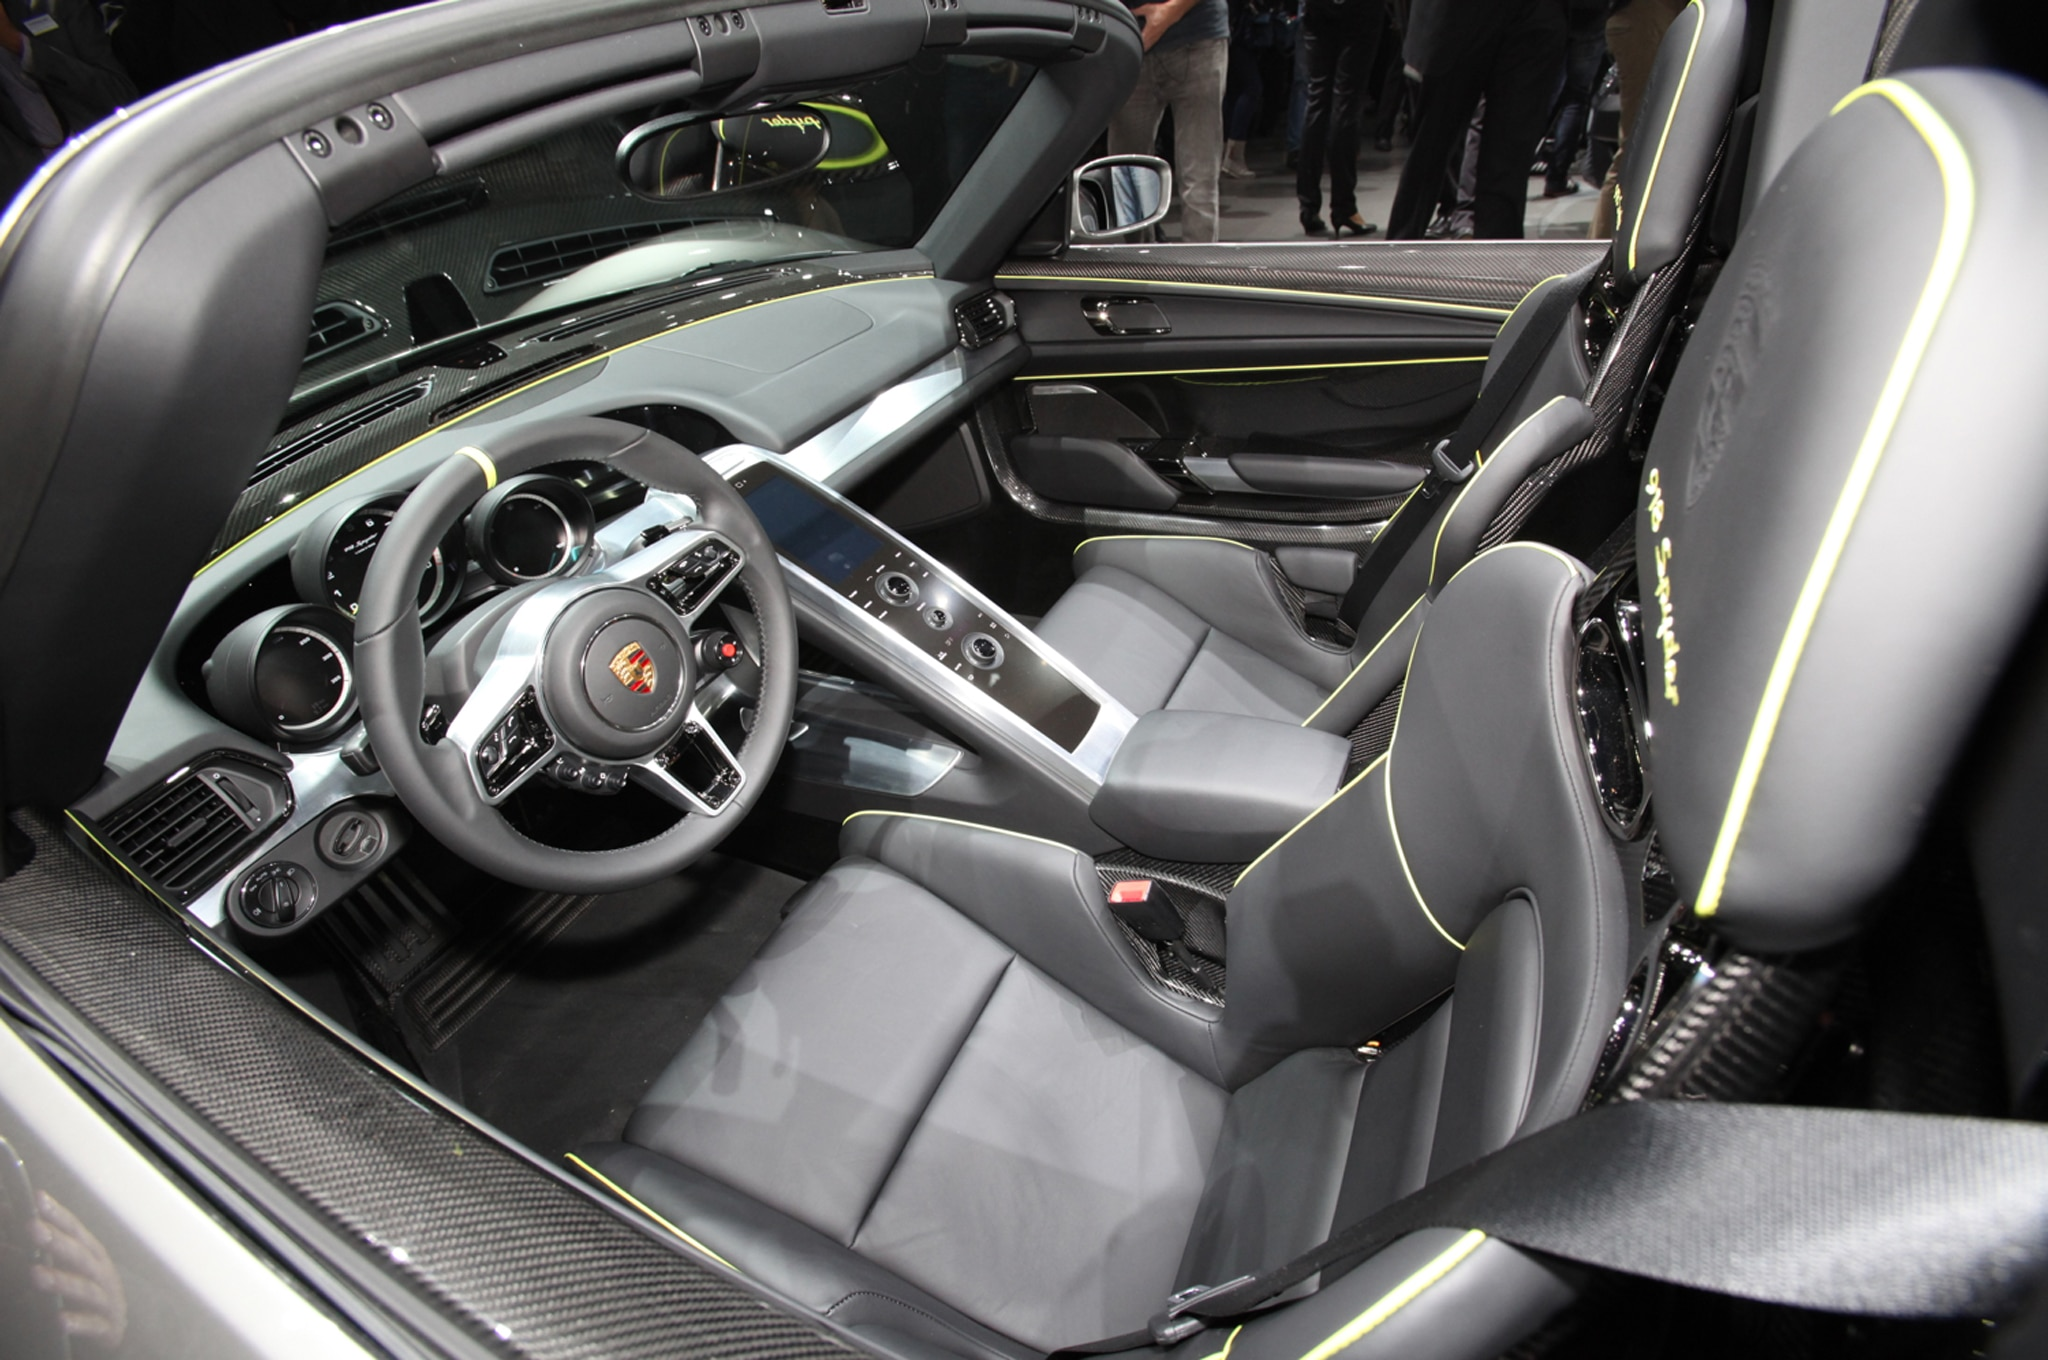 porsche 918 spyder 2015 porsche 918 spyder interior 2015 porsche porsche 918 spyder super hybrid interior